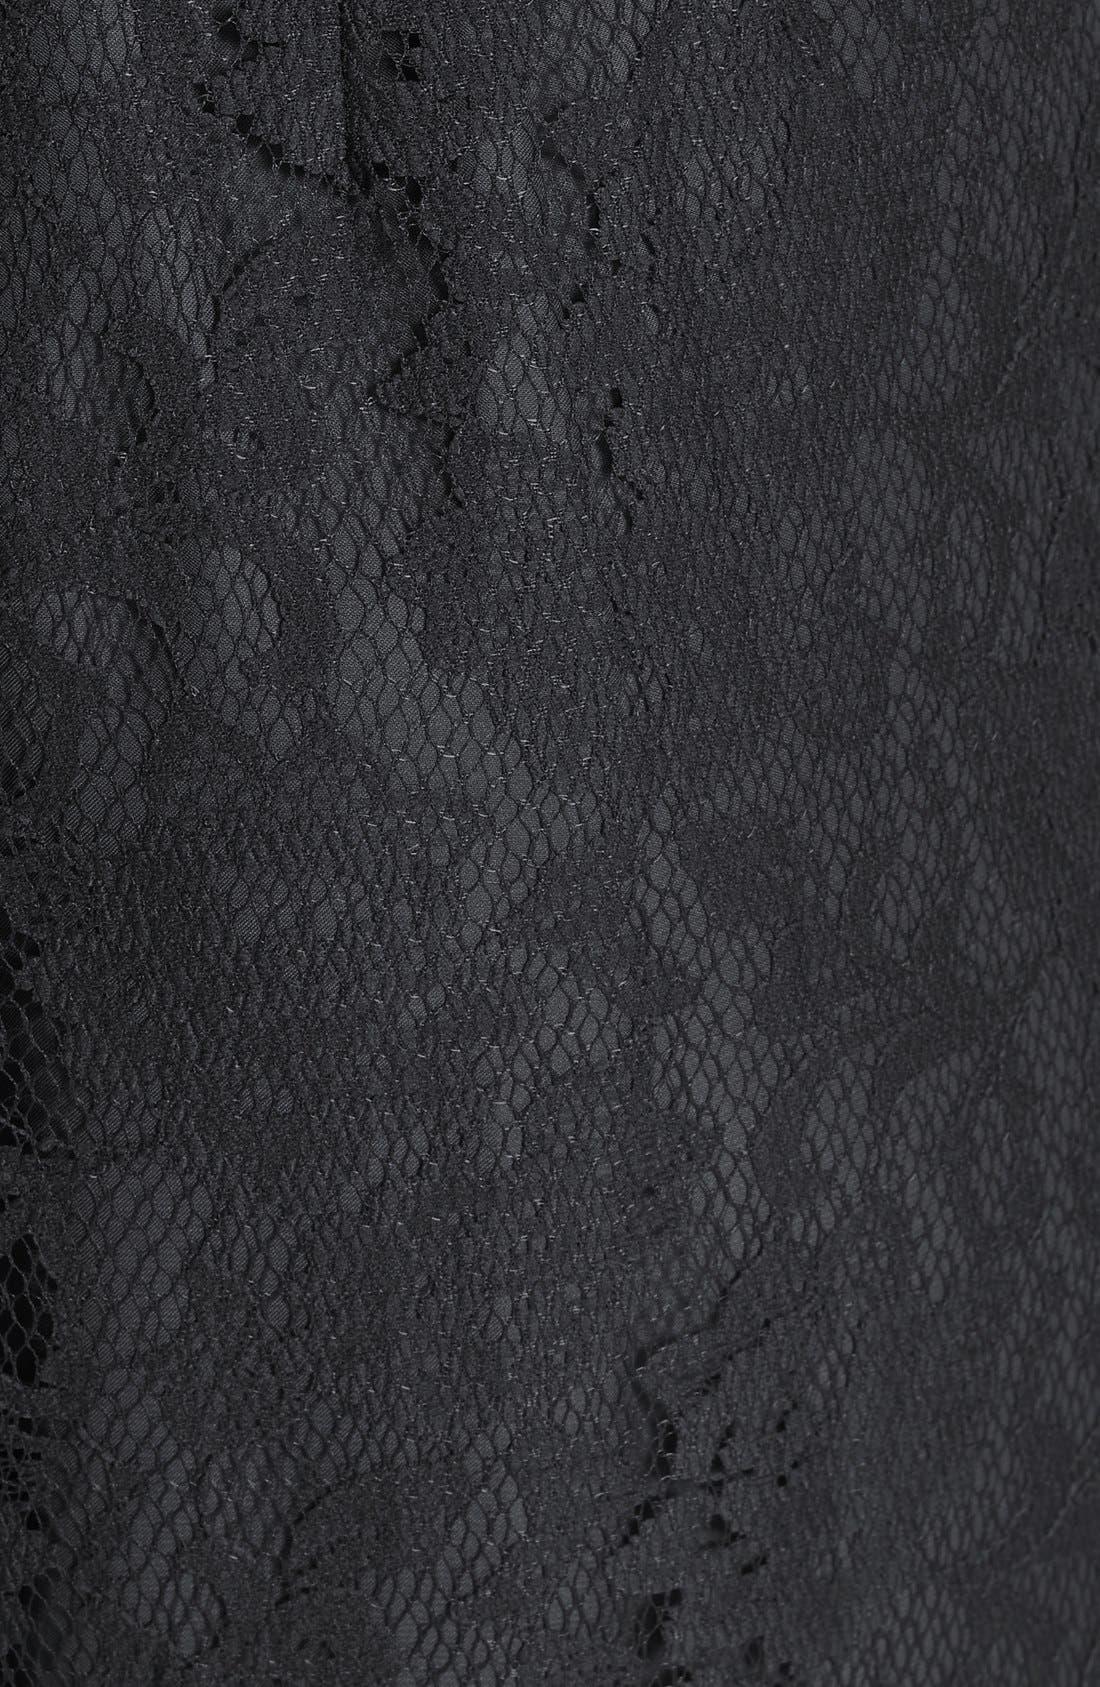 Illusion Yoke Lace Gown,                             Alternate thumbnail 3, color,                             022